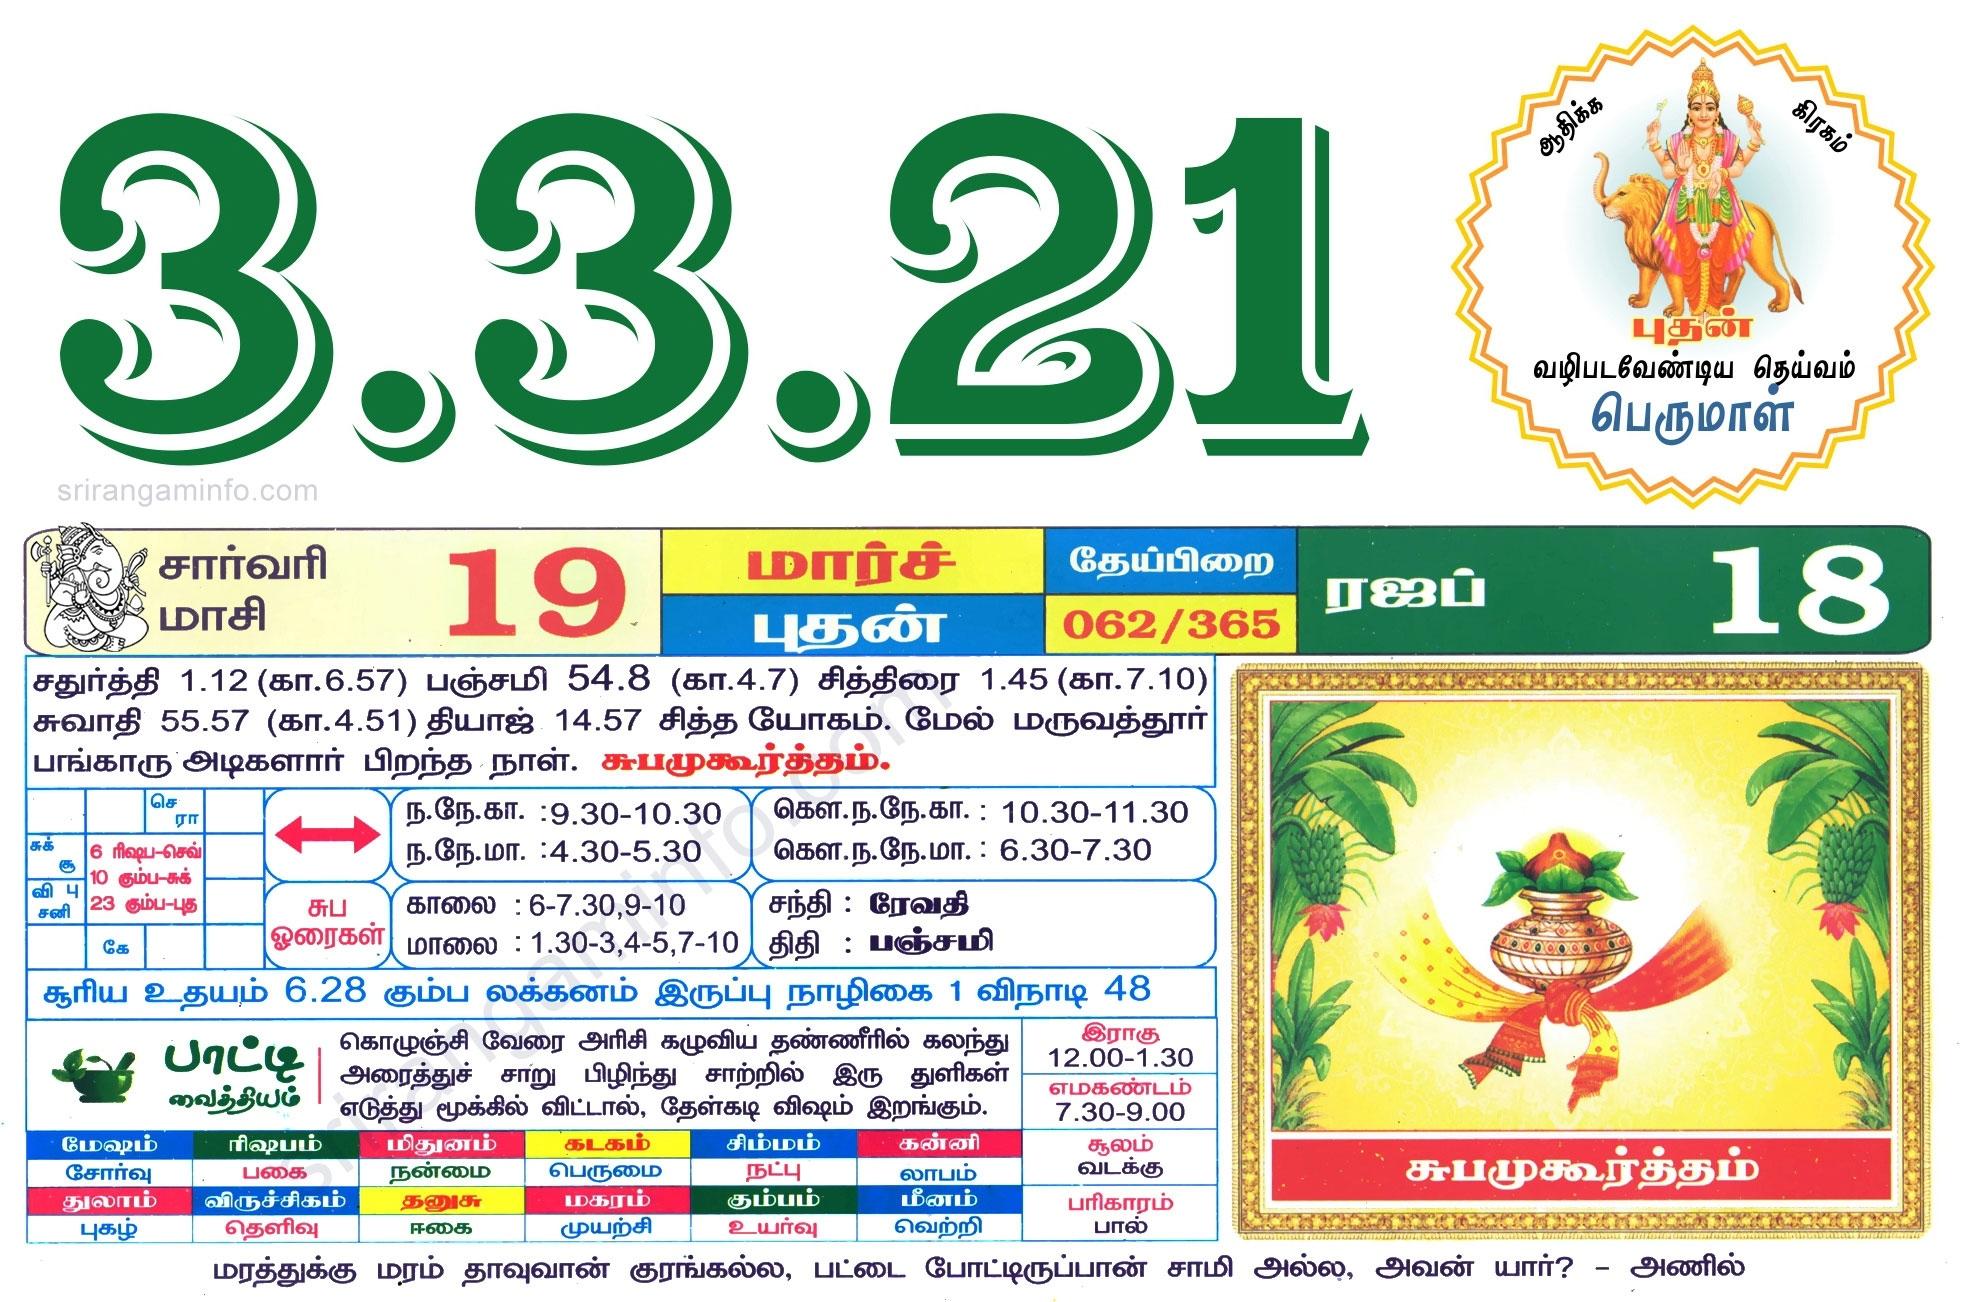 Tamil Monthly Calendar 2021, Tamil Calendar 2021 To 2009 Tamil Monthly Calendar 2021 October